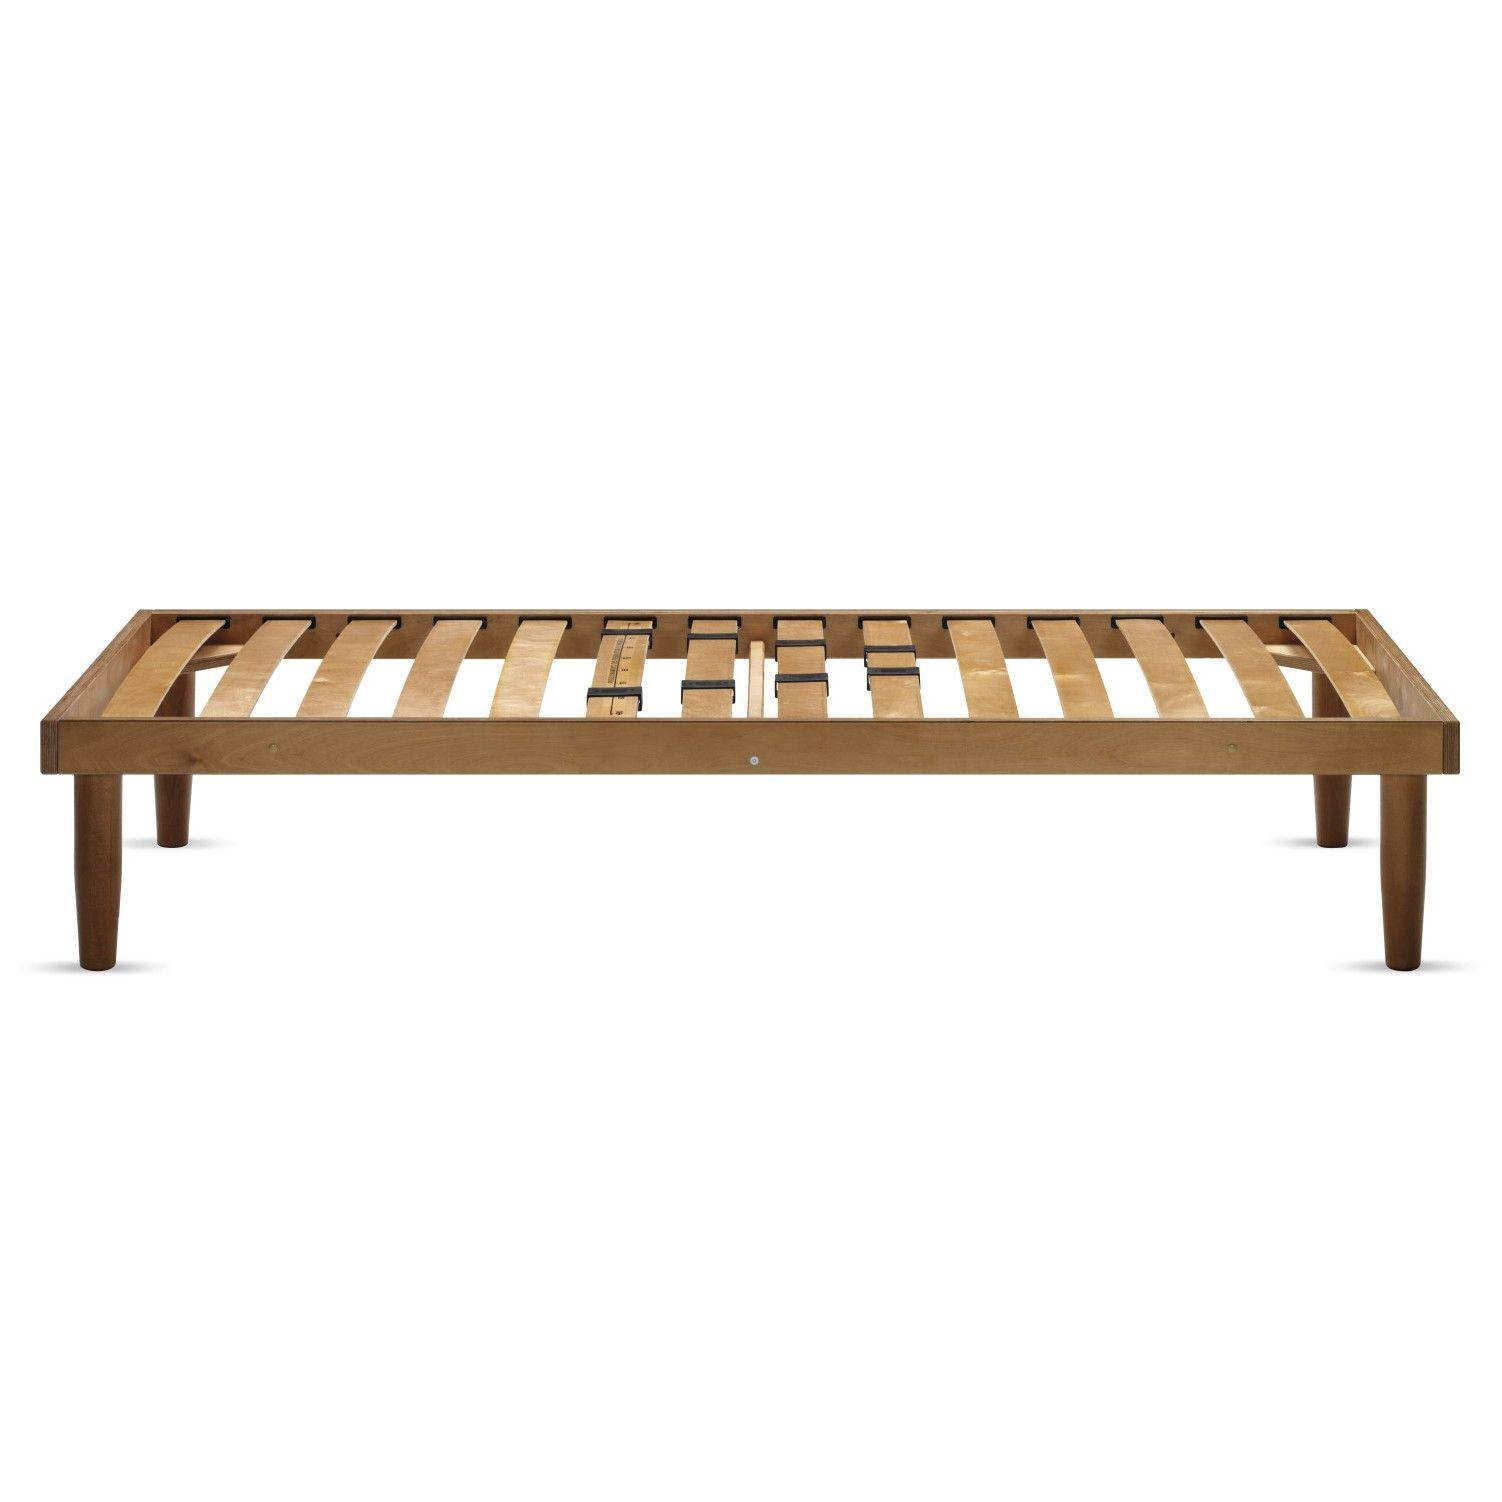 Wood Frame Federholzrahmen mit Füßen - ARREDACLICK | BED | Pinterest ...